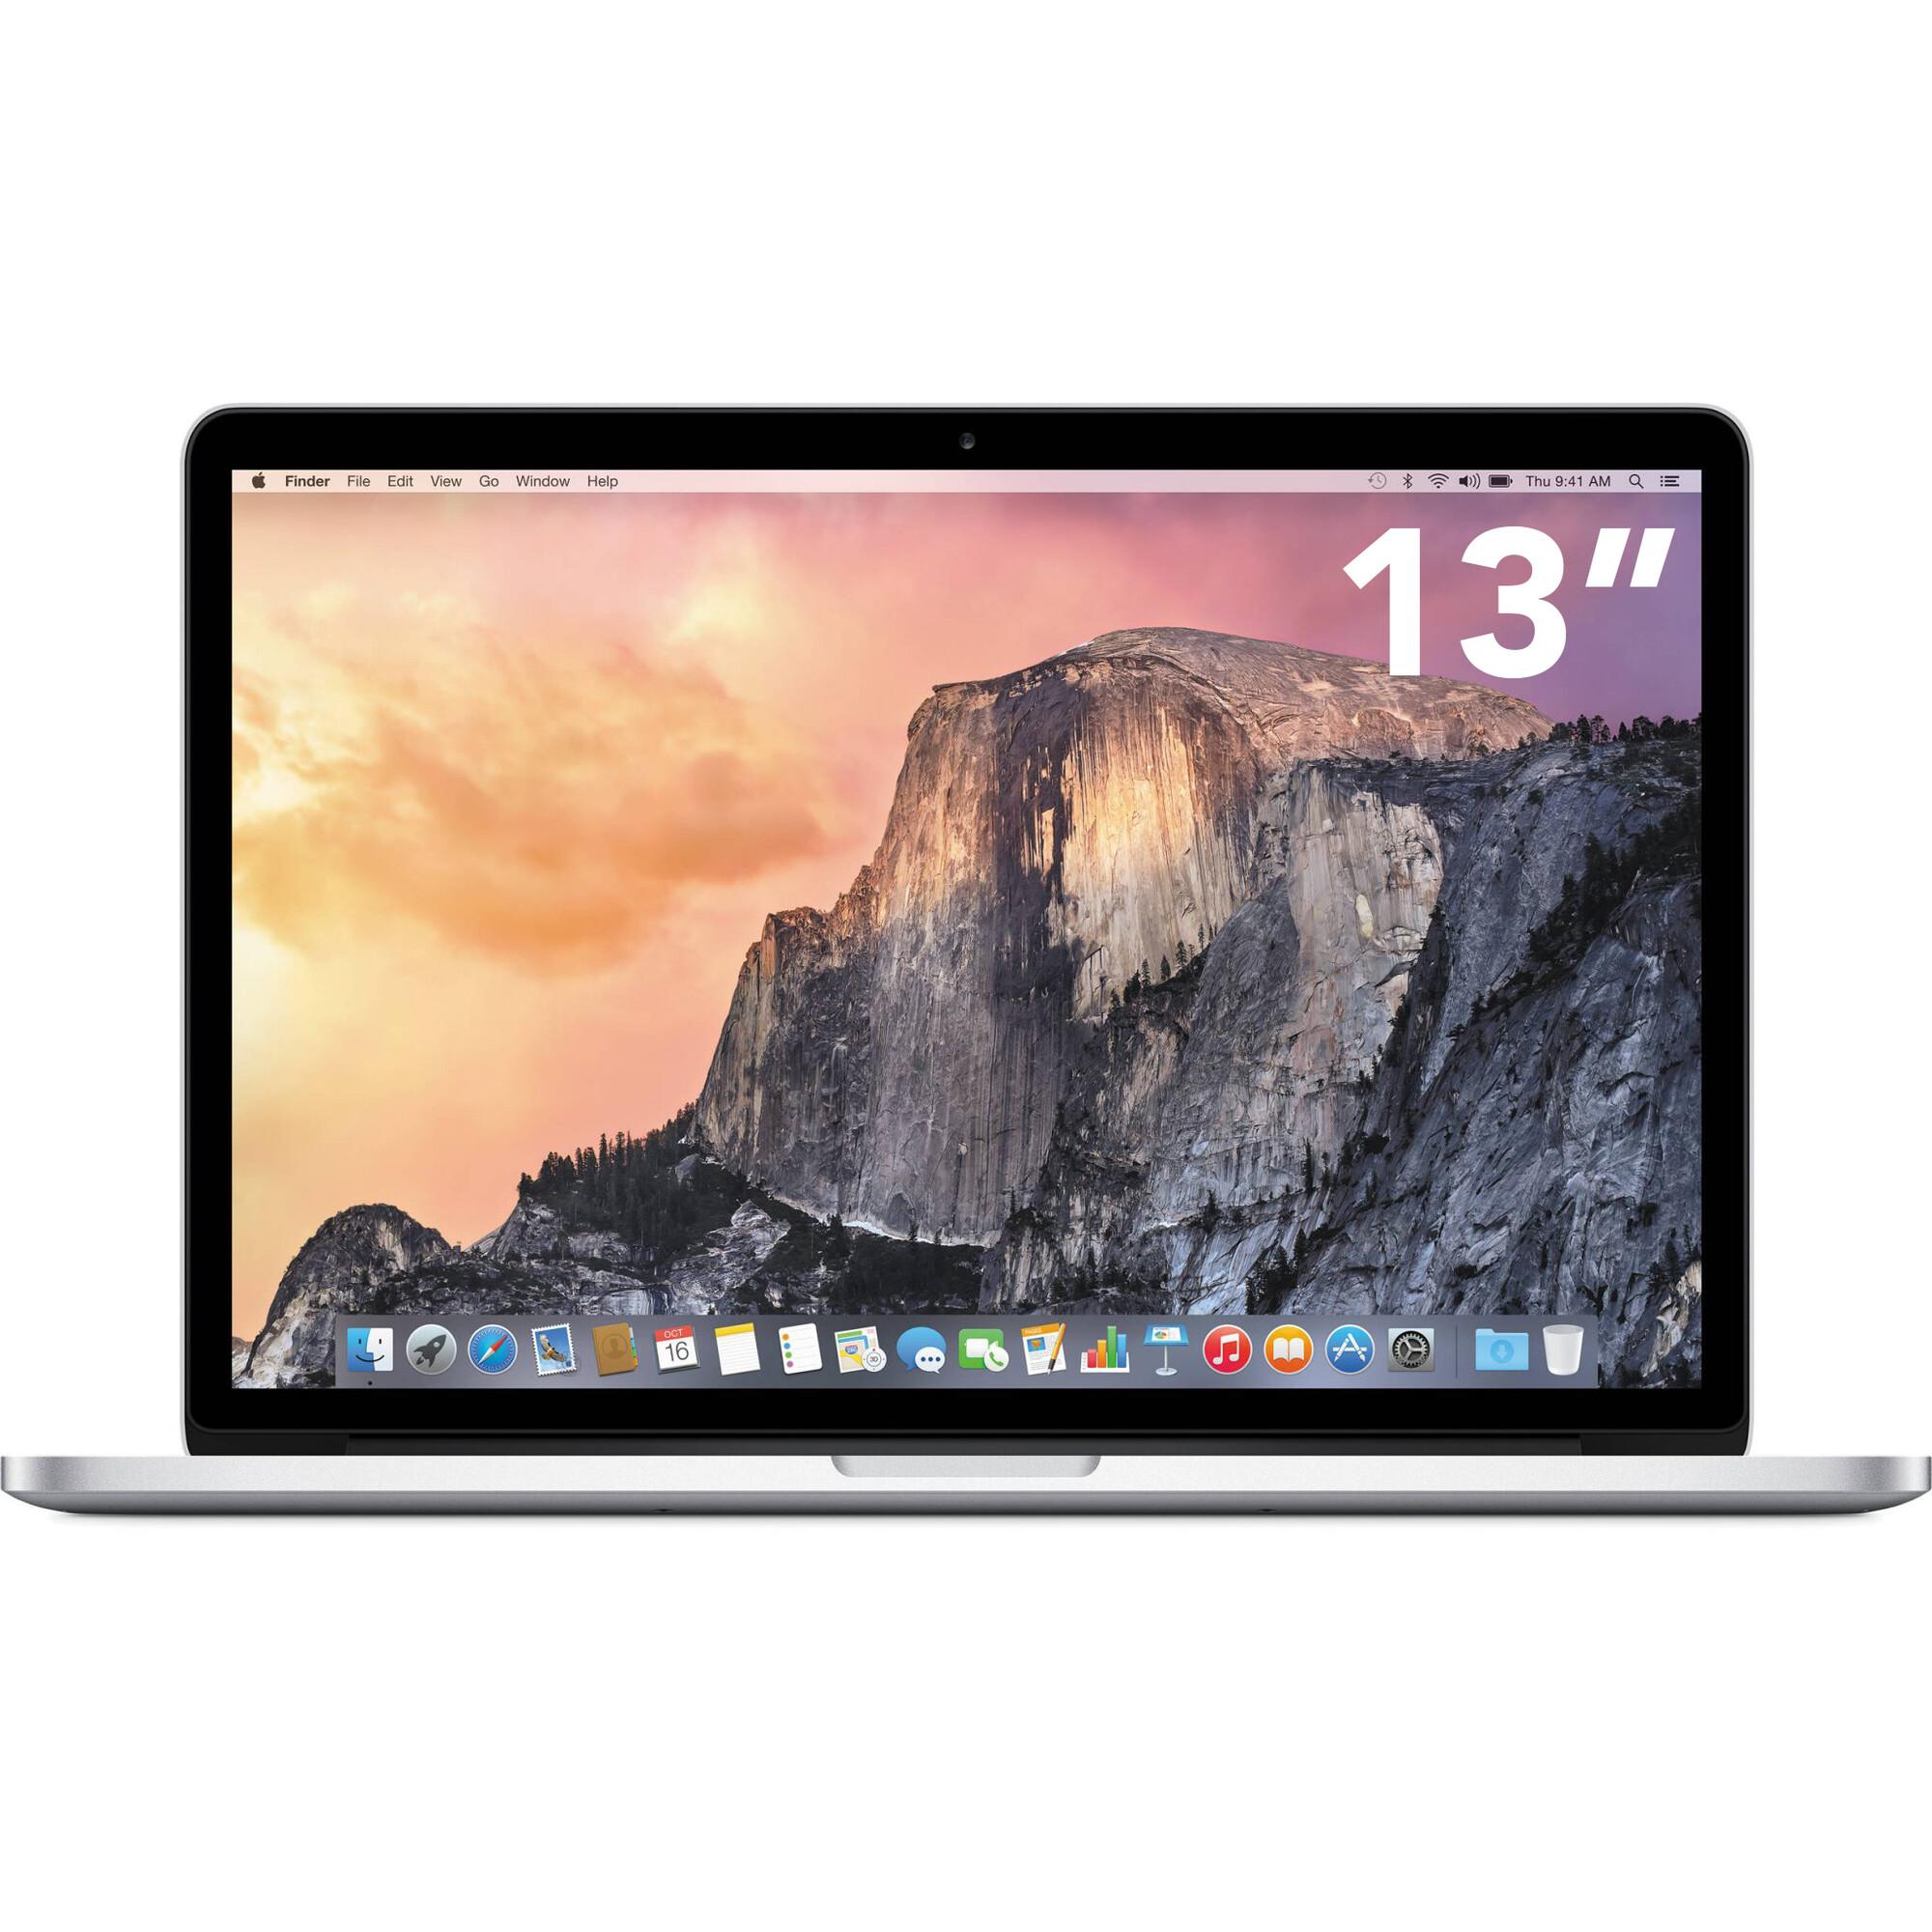 Apple MacBook Pro (Retina, 13-inch, Late 2012) i7 3520M 8GB RAM 512GB SSD